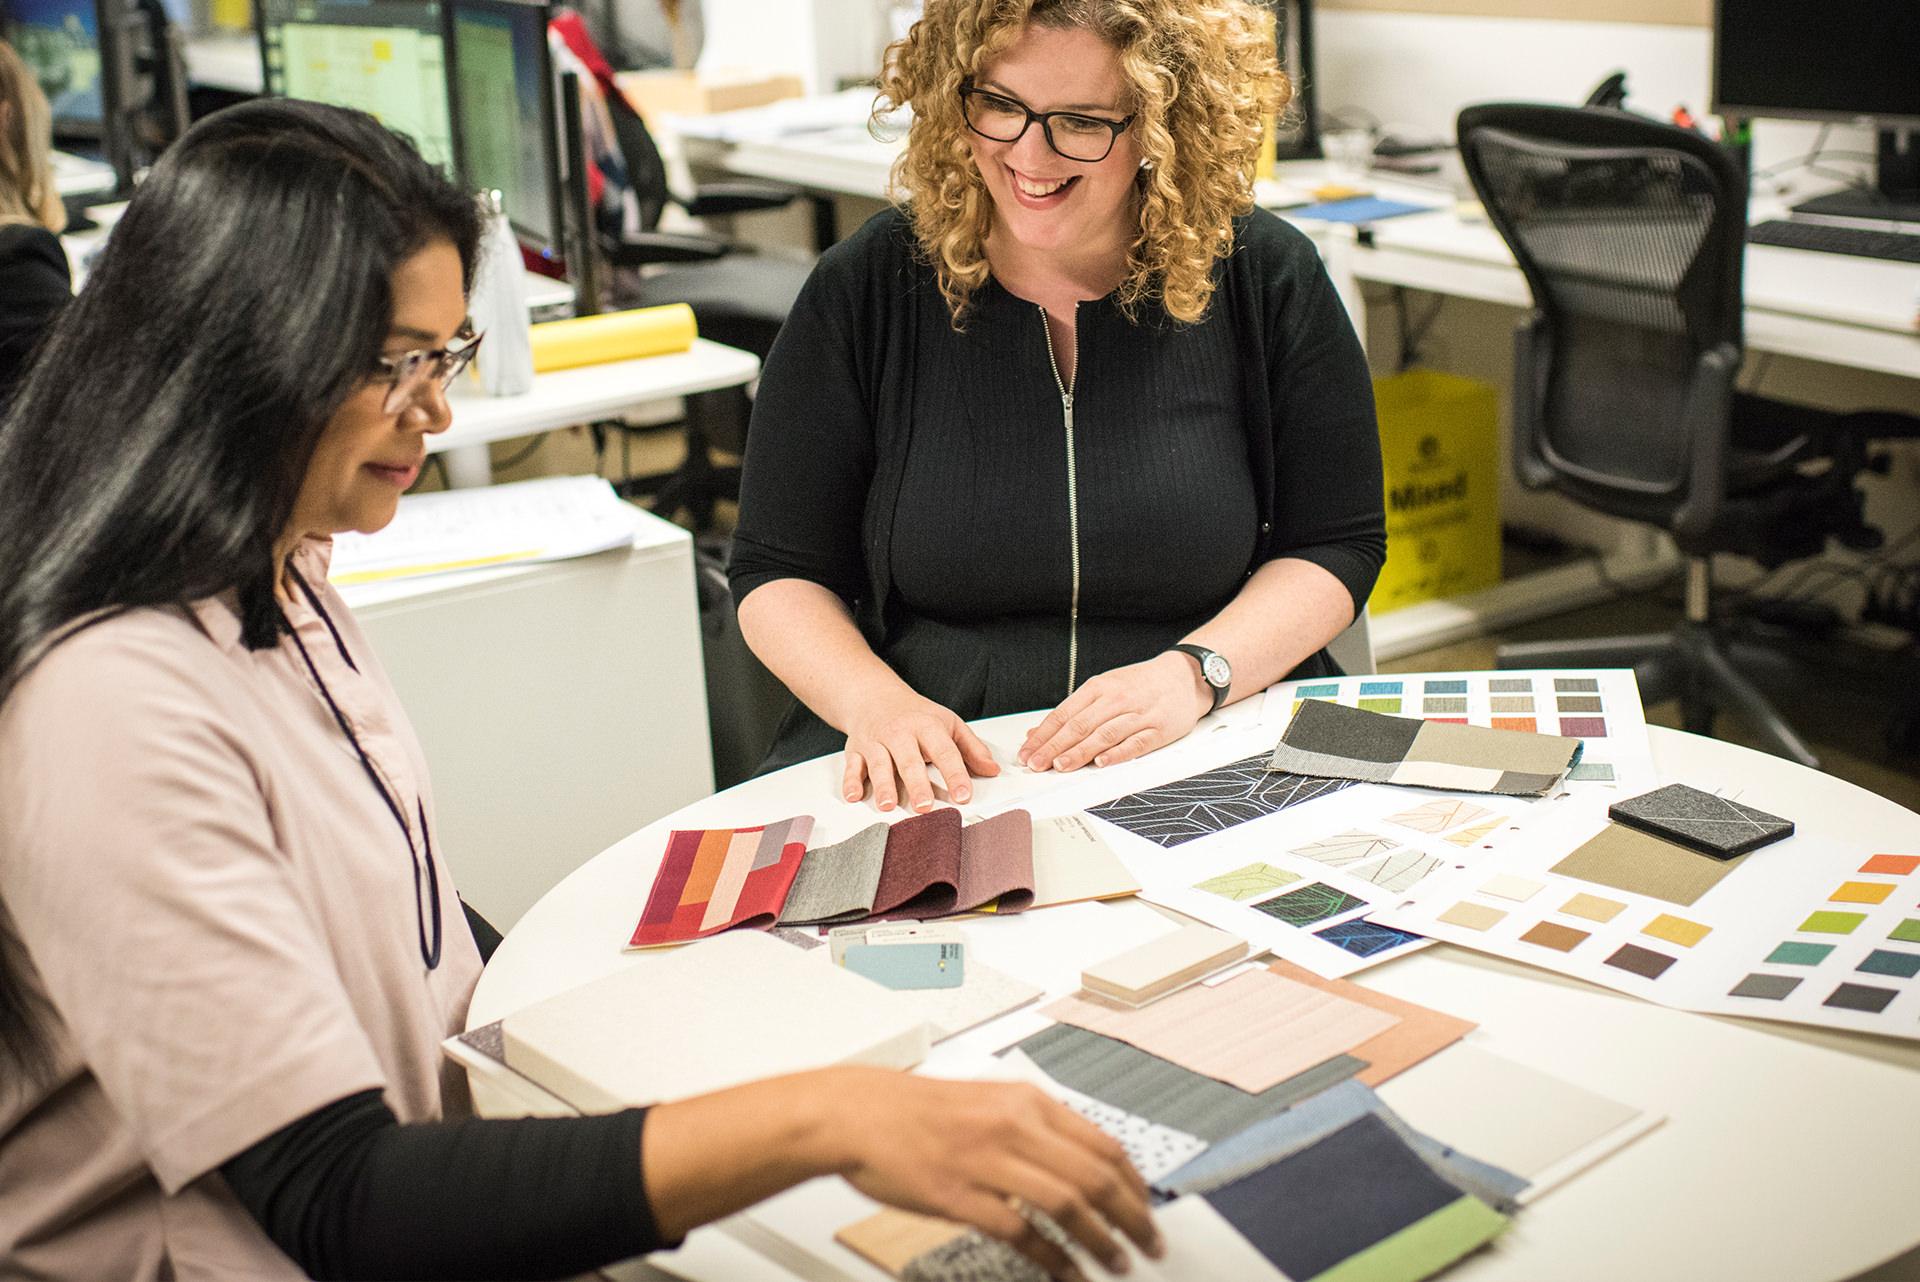 180925 Careers at BLP Interior Designers News